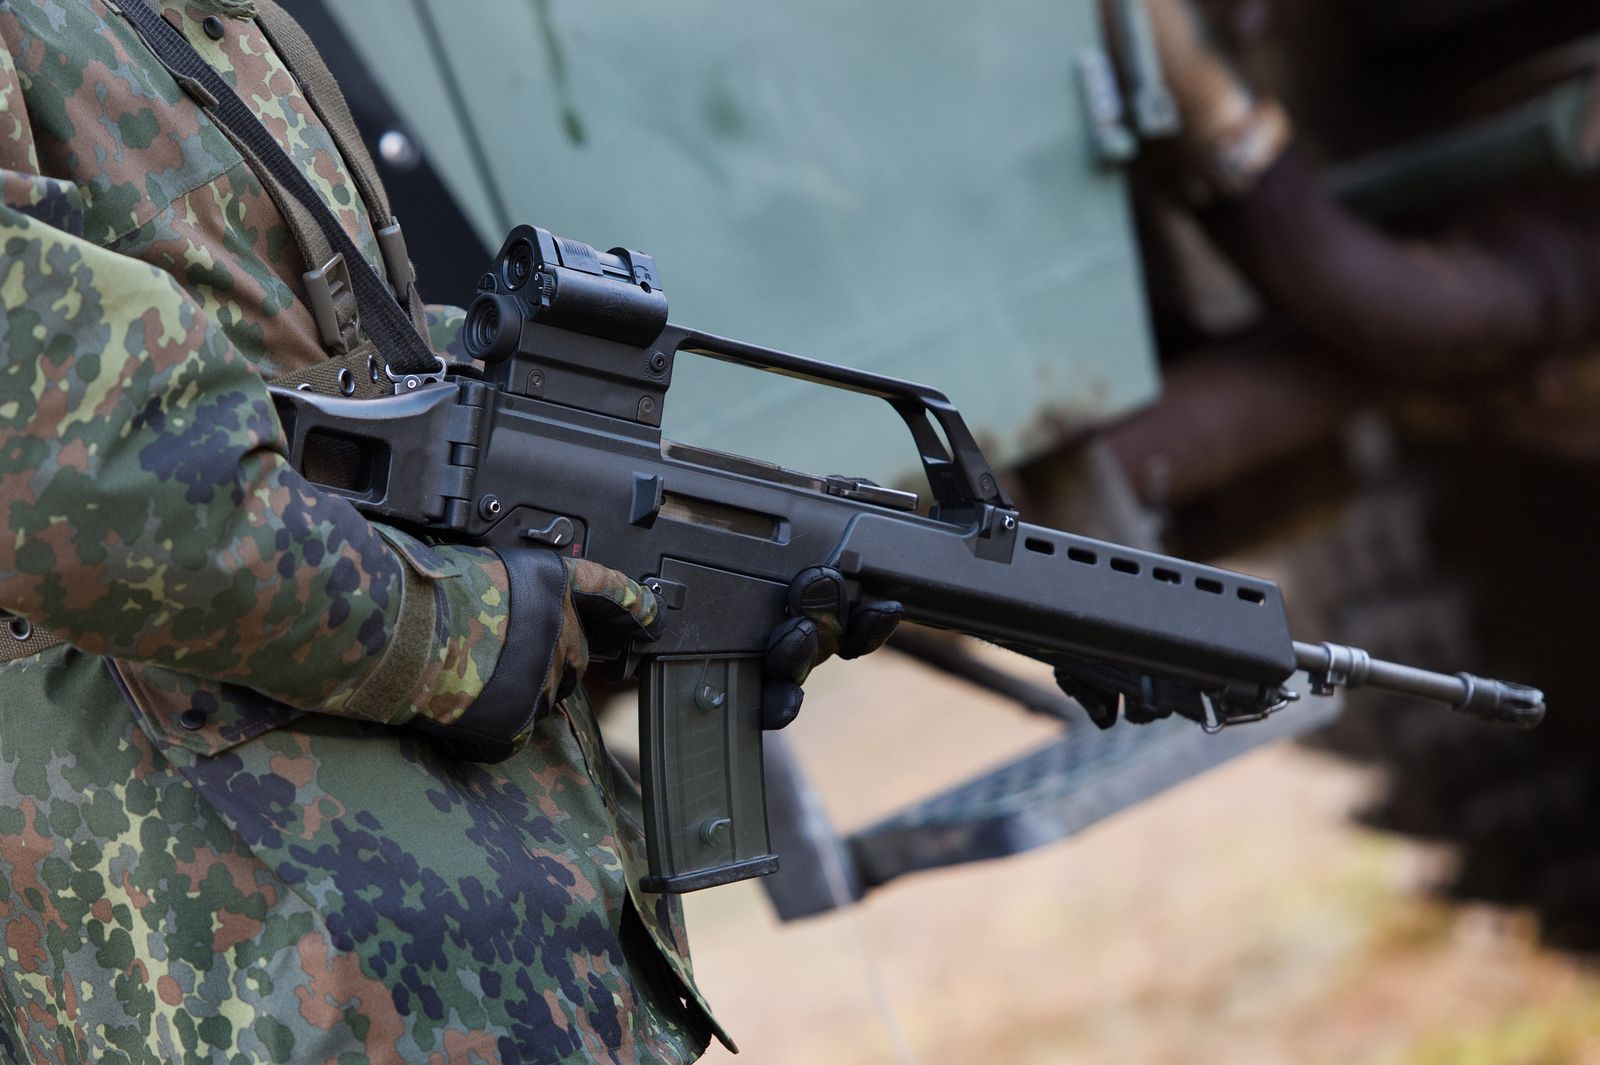 Heckler & Koch/ Sturmgewehr/ G36